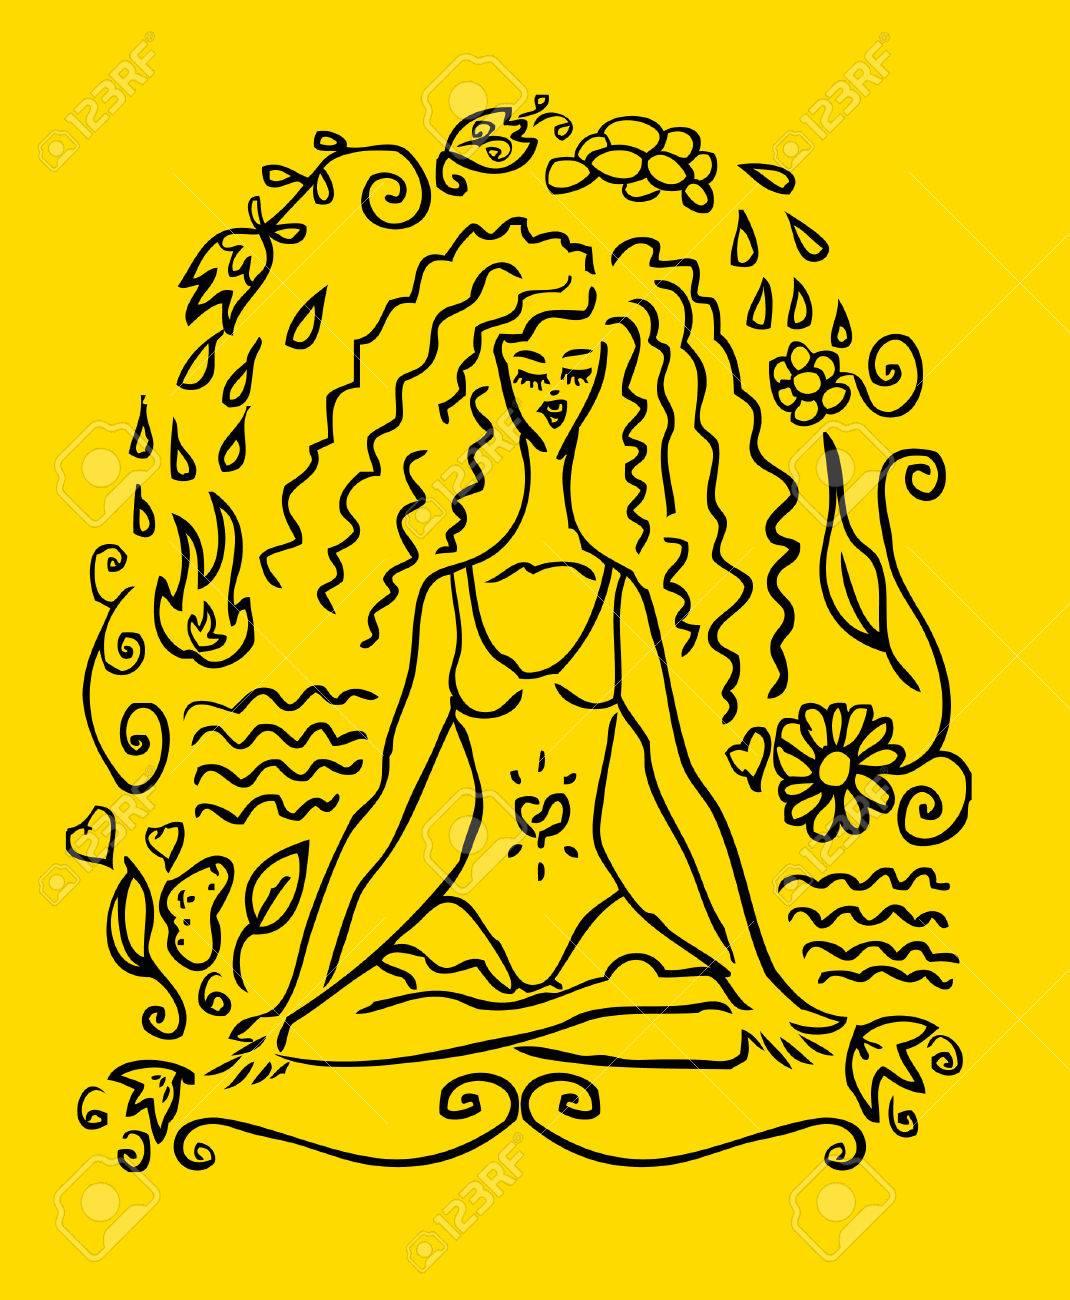 Yoga Femme Tatouage Fausse Carte Embleme Icone Fond Jaune Banque